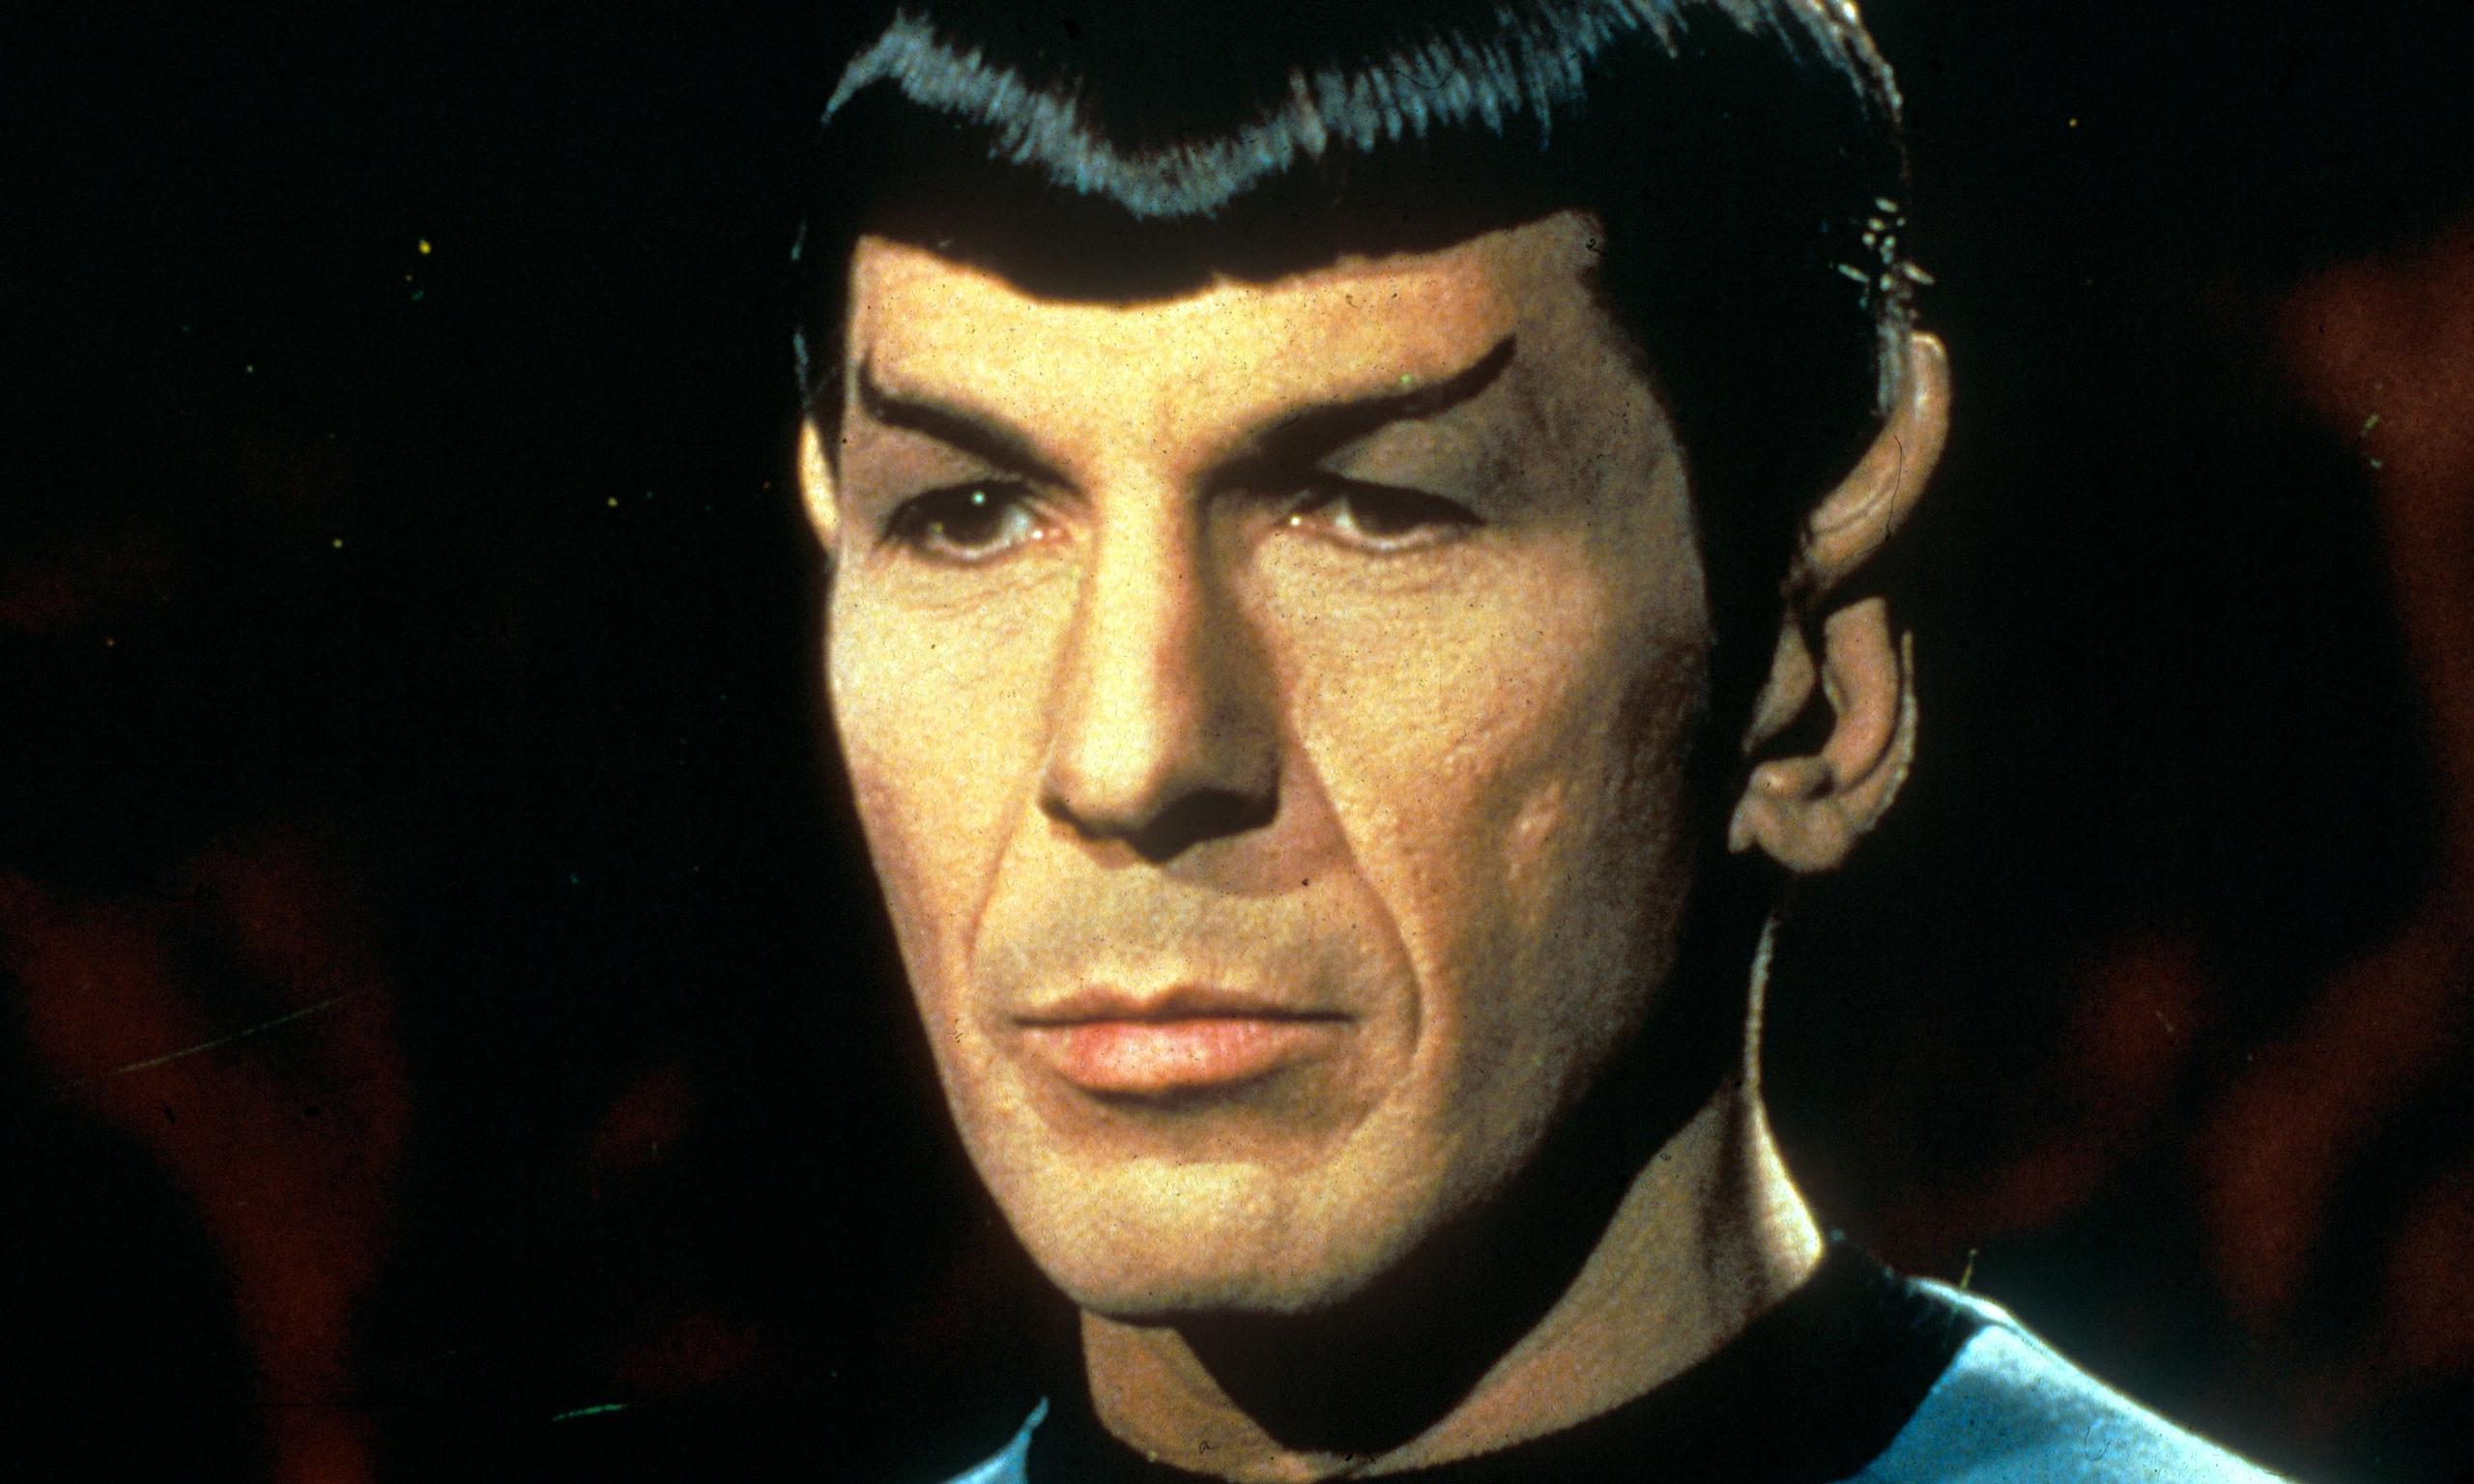 Leonard Nimoy as Mr Spock in Star Trek. Photograph: Moviestore Collect